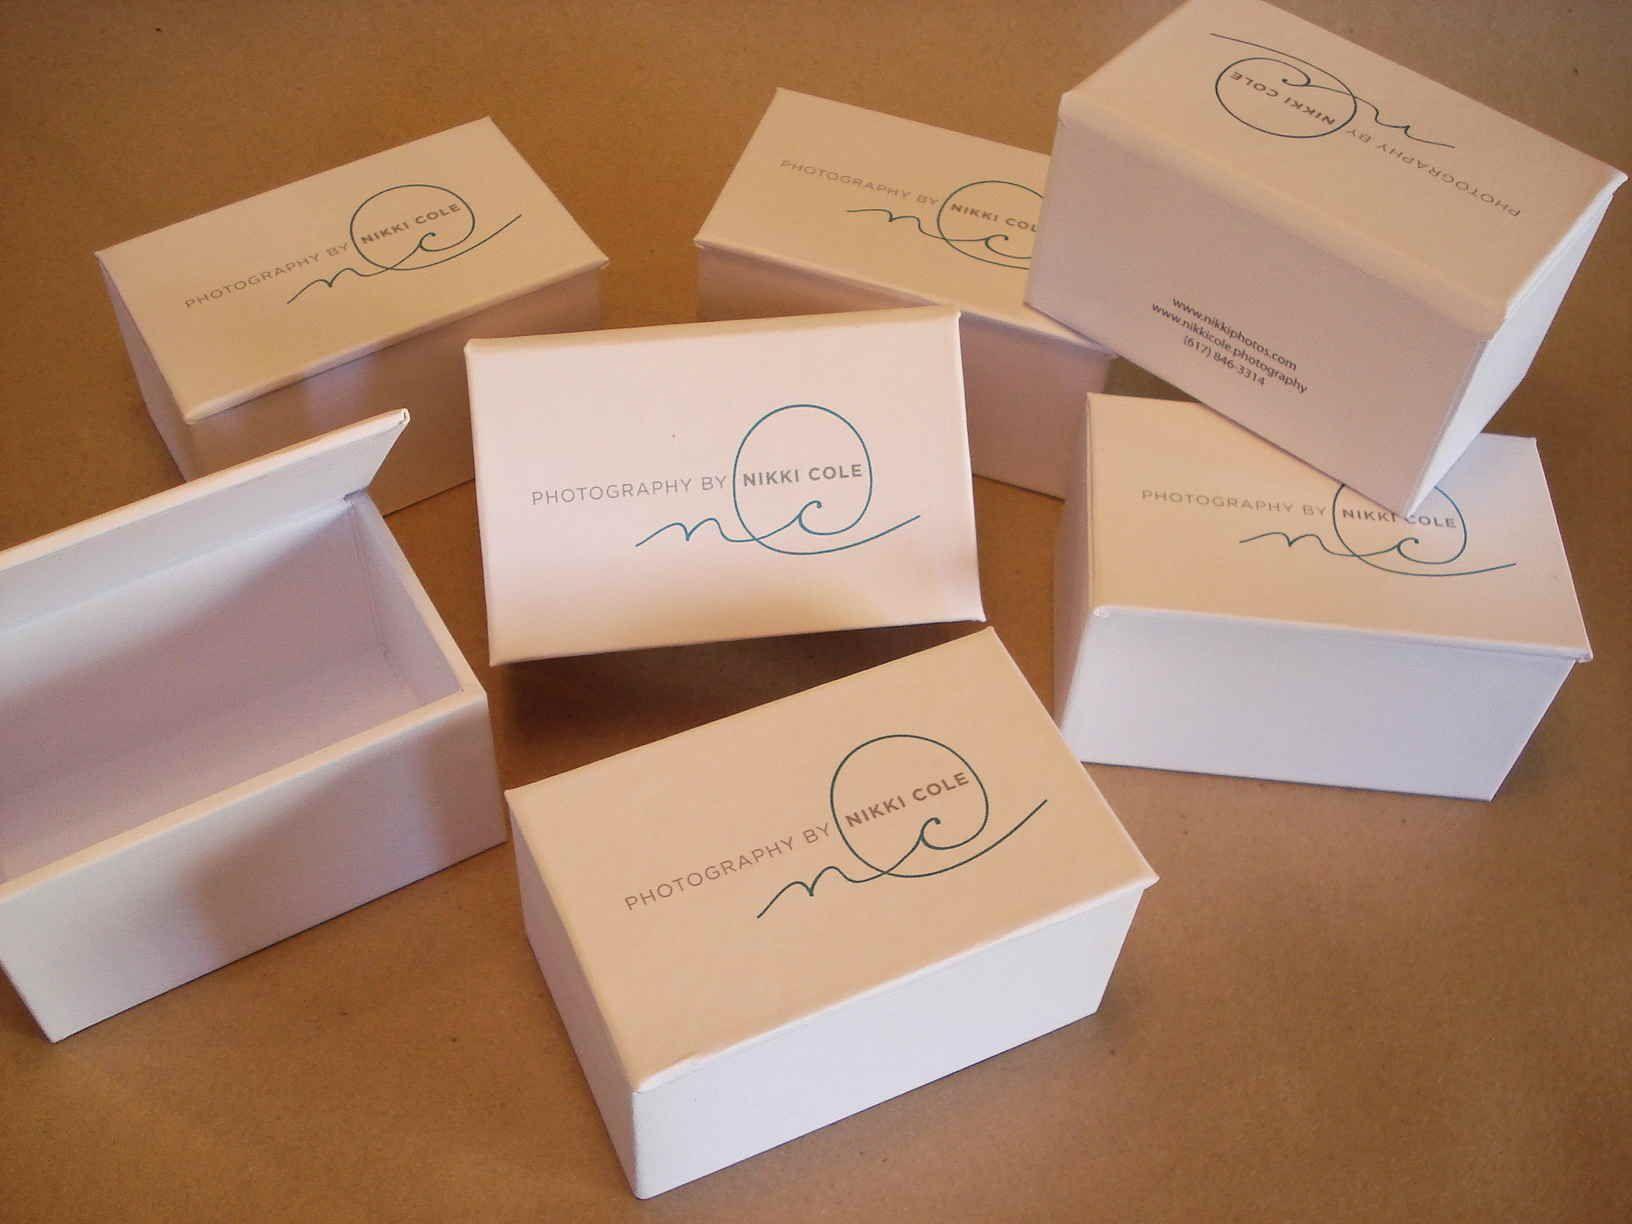 custom boxes for flash drives usb memory sticks thumb drives